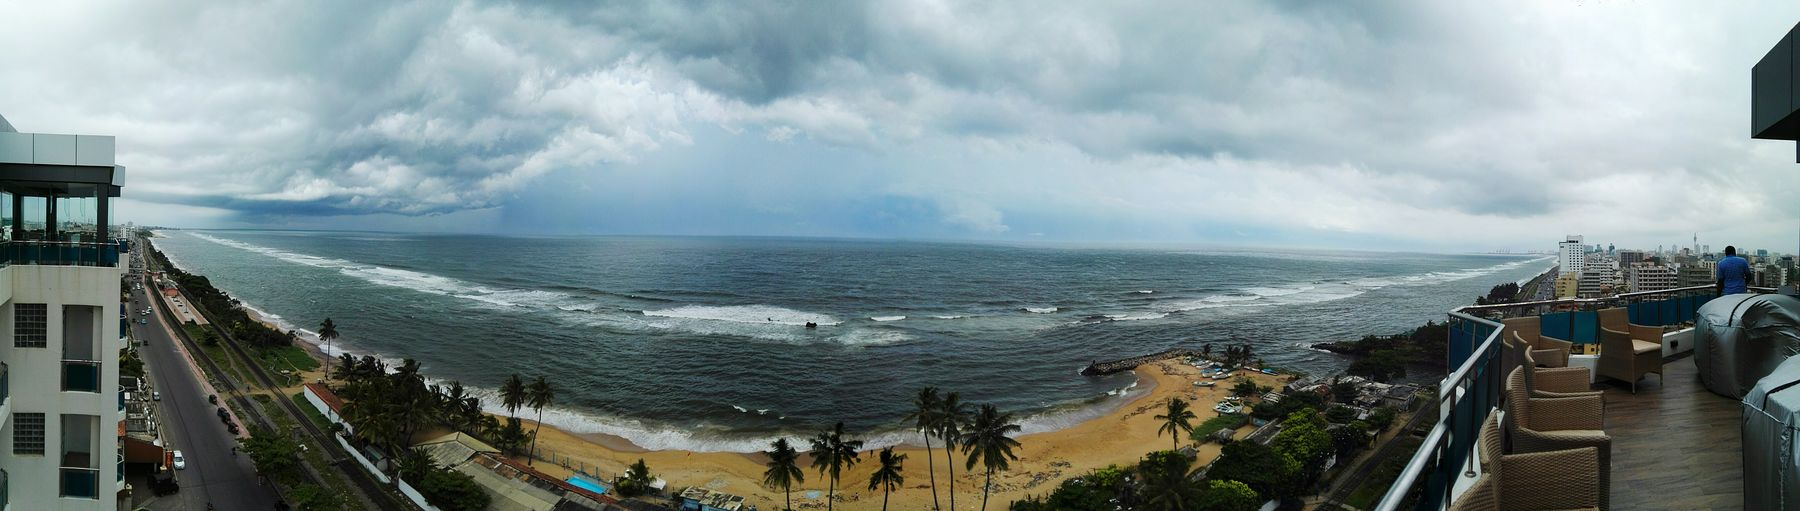 Colombo Beach Sea And Sky Topfloorview Mount Lavinia Sri Lanka Panorama